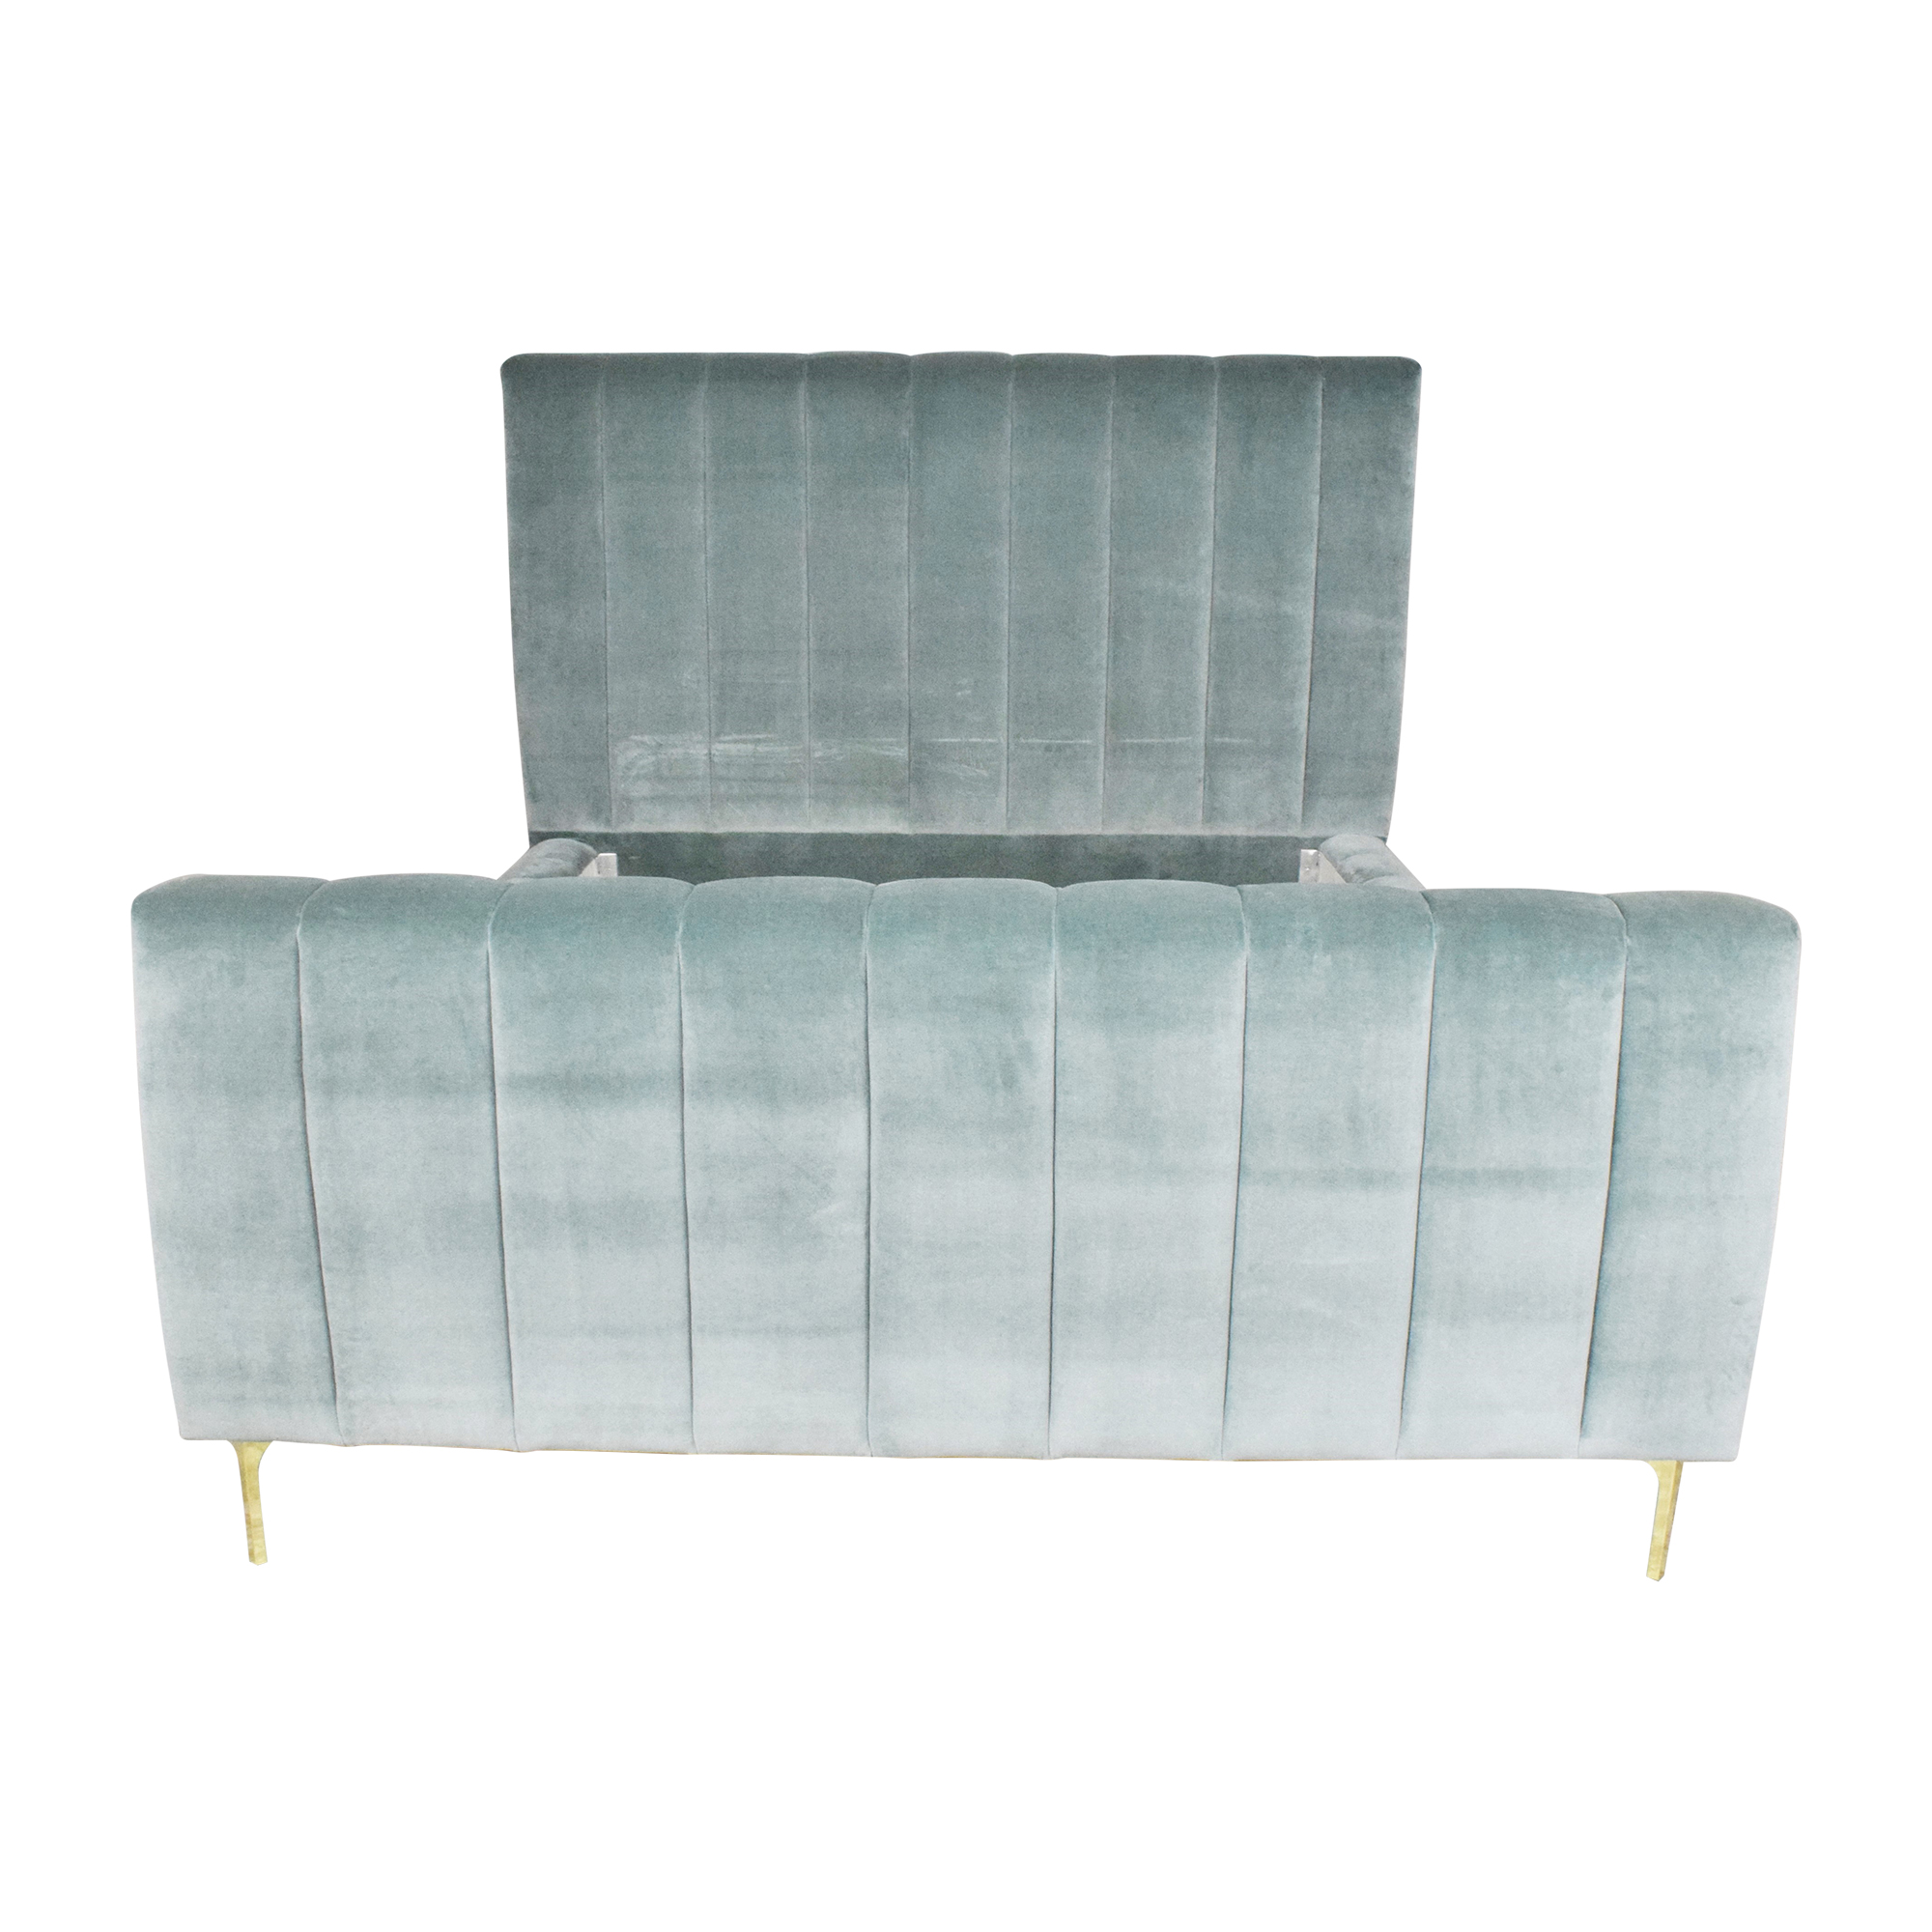 ModShop Shoreclub Queen Bed sale